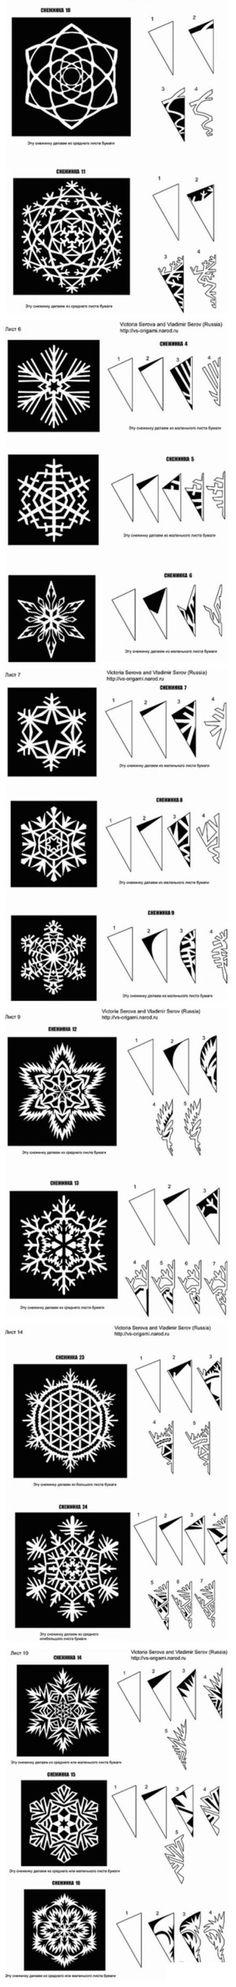 очумелые ручки | Kirigami, Crafts and Origami